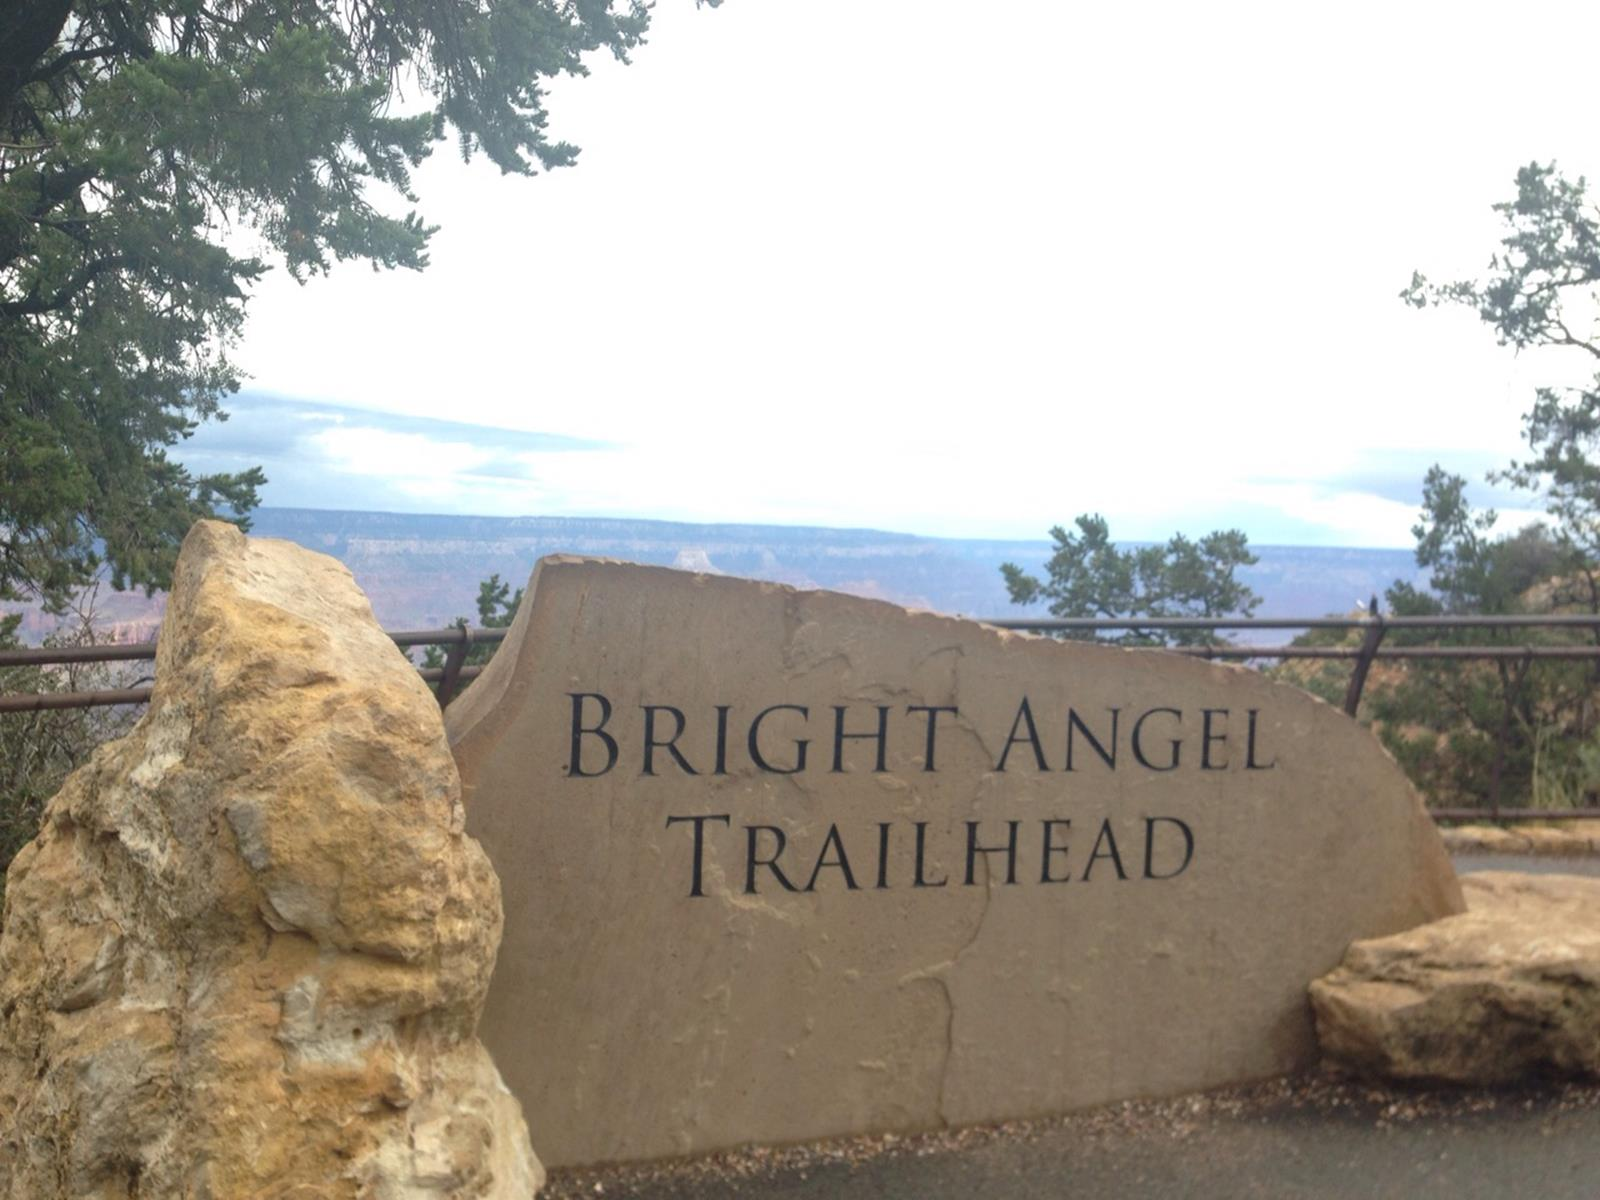 Hier gehts los zum Bright Angle Trail